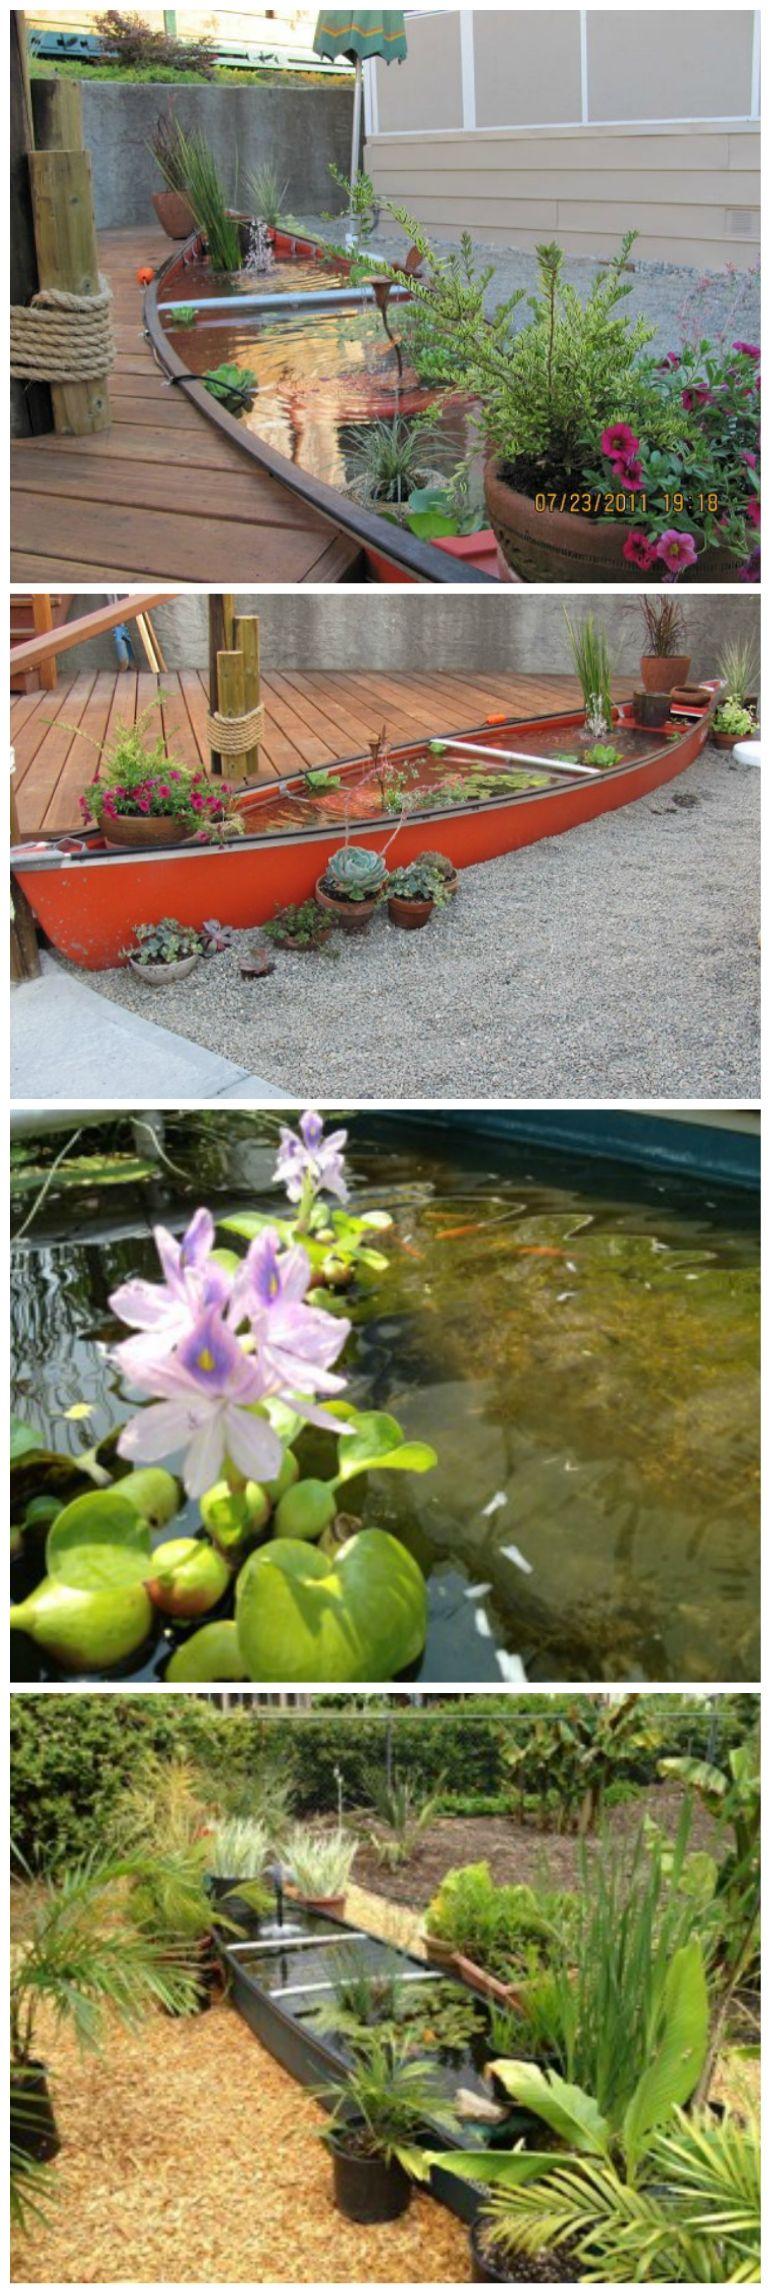 How to Create A Nautical Landscape Theme With A Canoe Pond